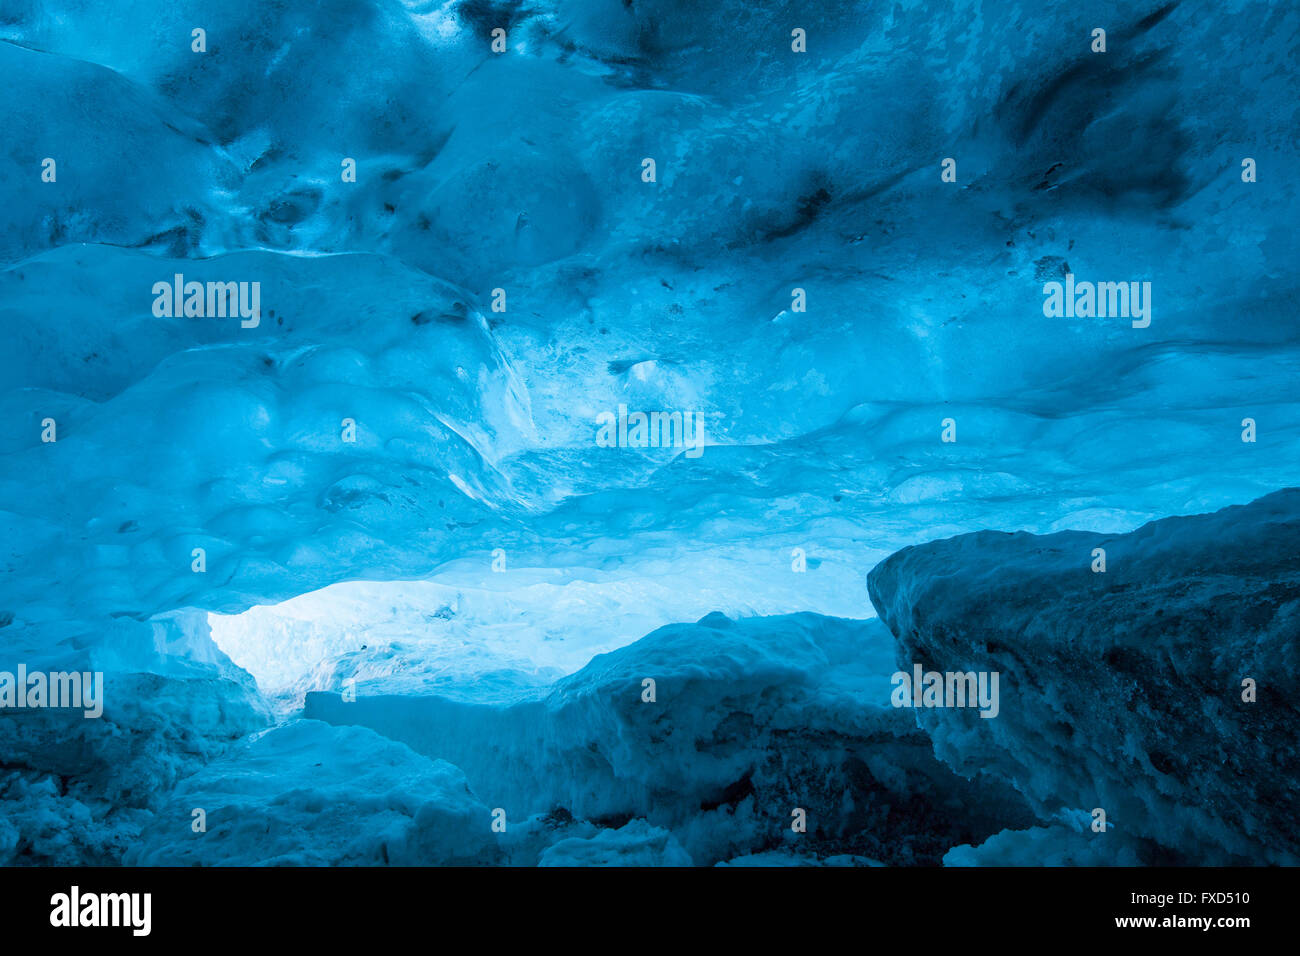 Blue ice mixed with volcanic ash in ice cavern inside Breidamerkurjokull, outlet glacier of Vatnajökull / Vatna - Stock Image